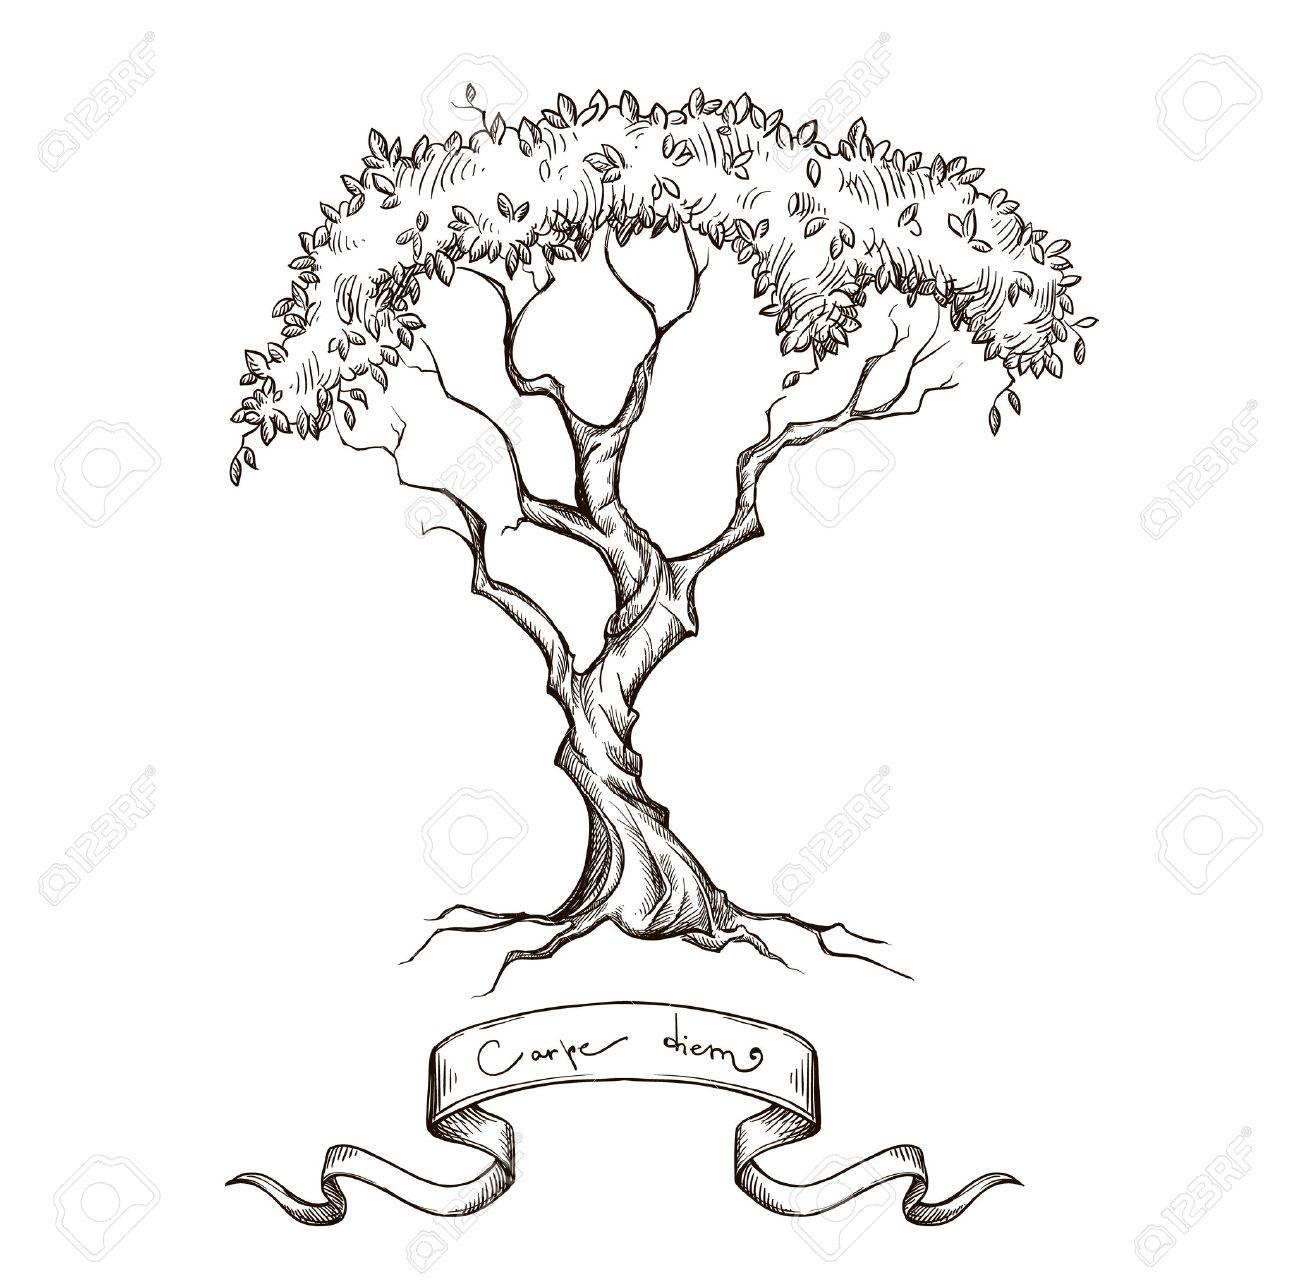 Branch clipart drawn Clipart tree Hand white black